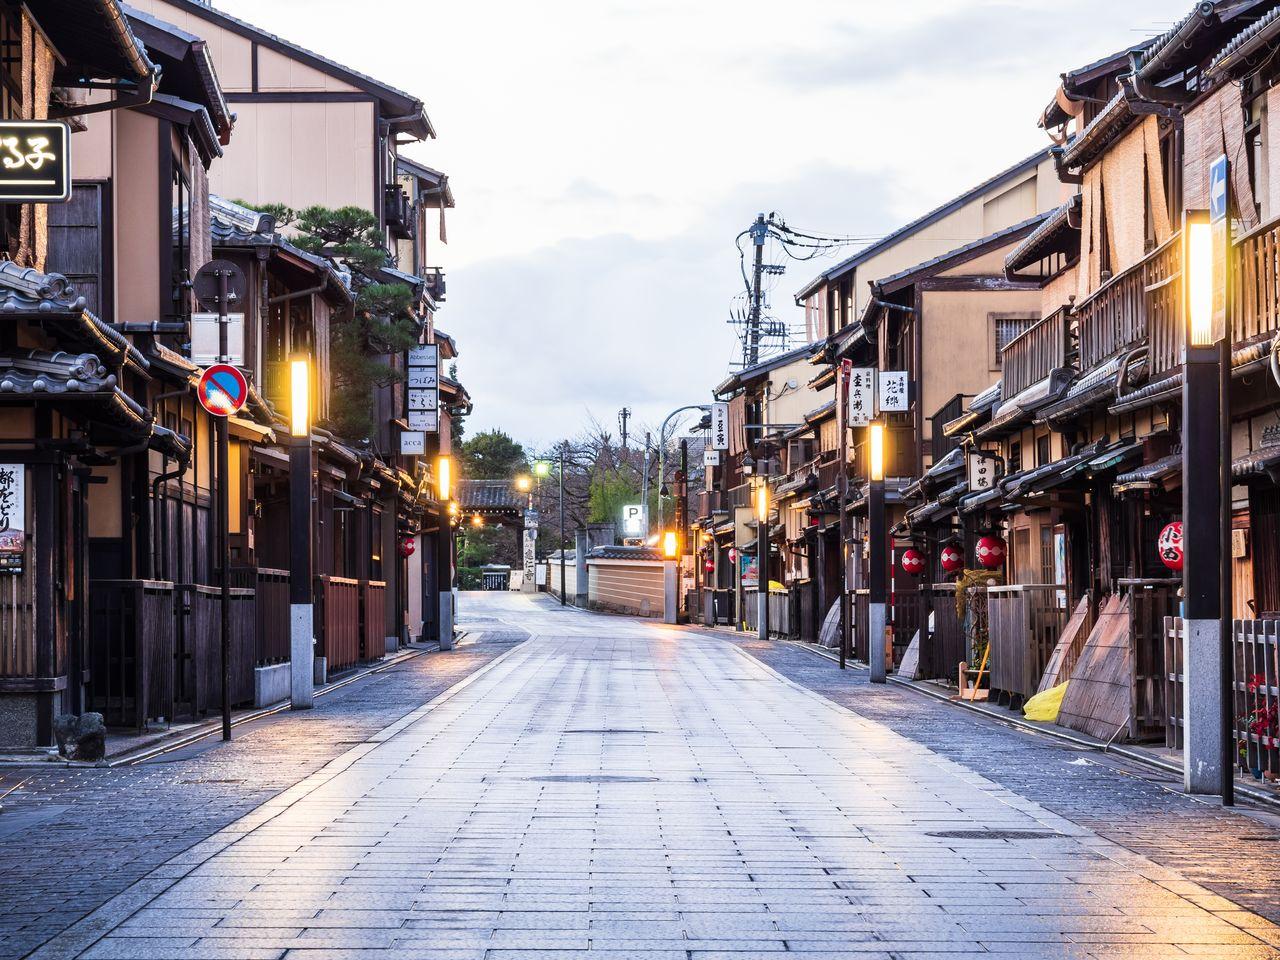 祇園・花見小路の街並み(京都市東山区、PIXTA)